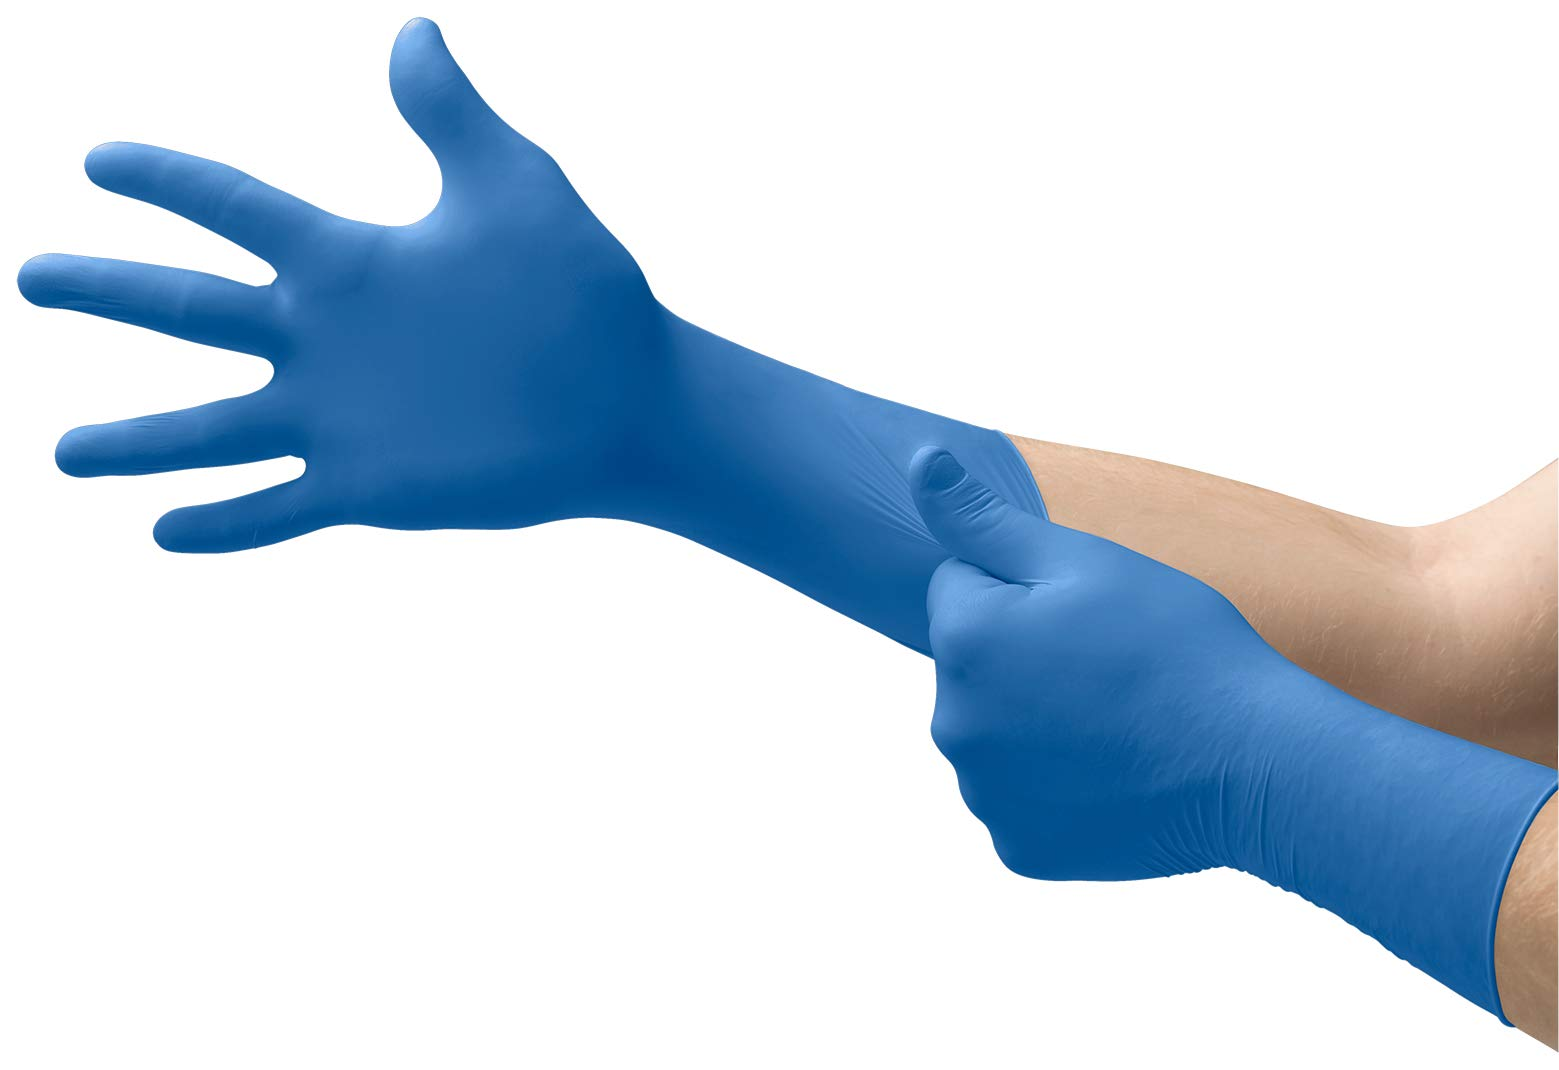 ANSELL MICROFLEX SAFEGRIP Powder-Free Extended Cuff Latex EXAM Gloves